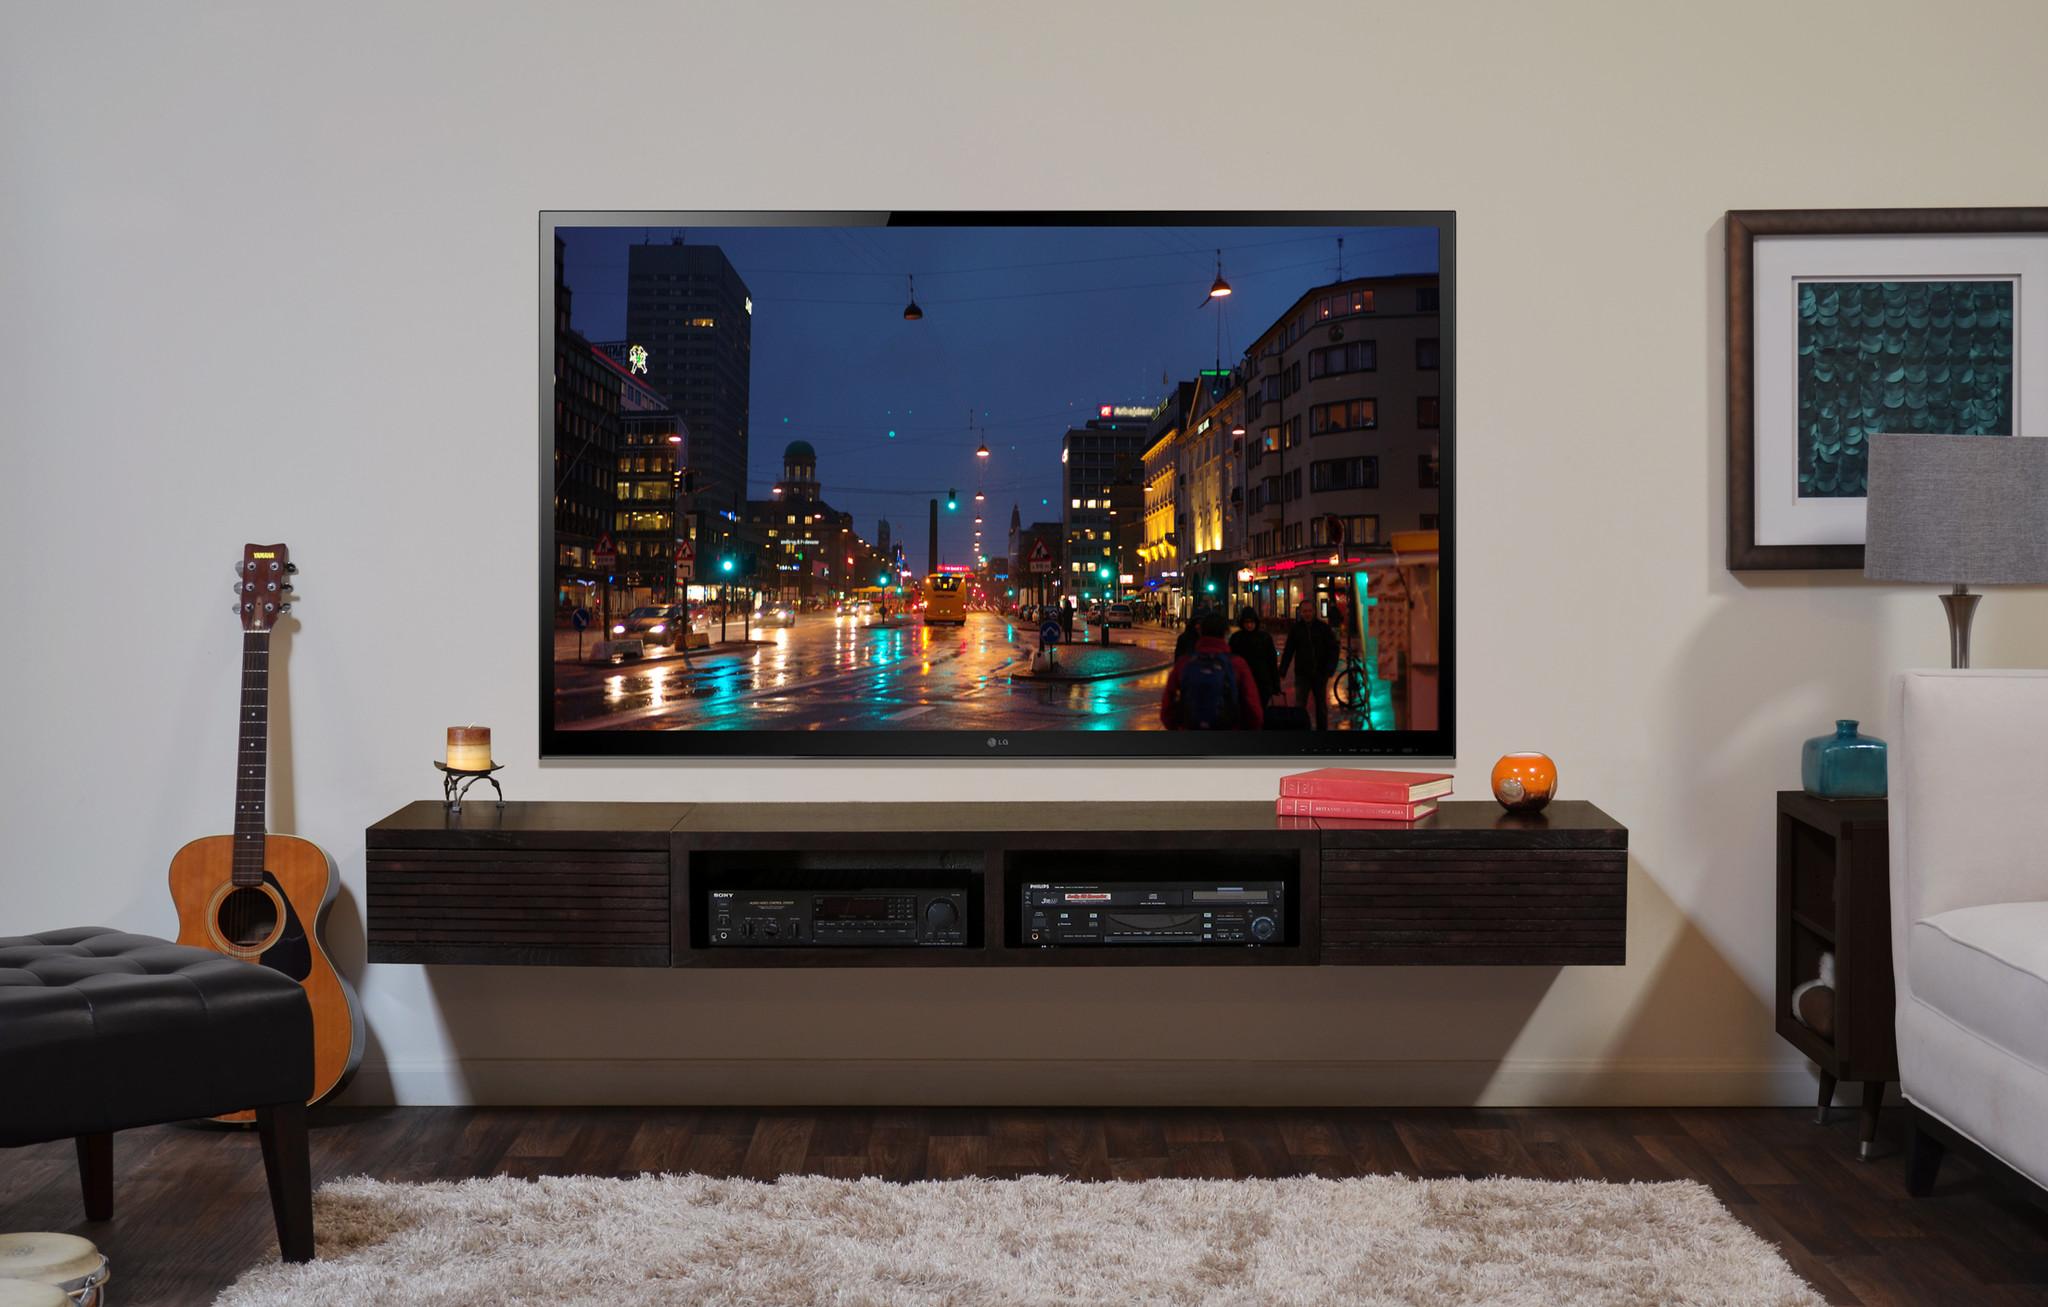 Projector mounters-Tv Mounters in TX